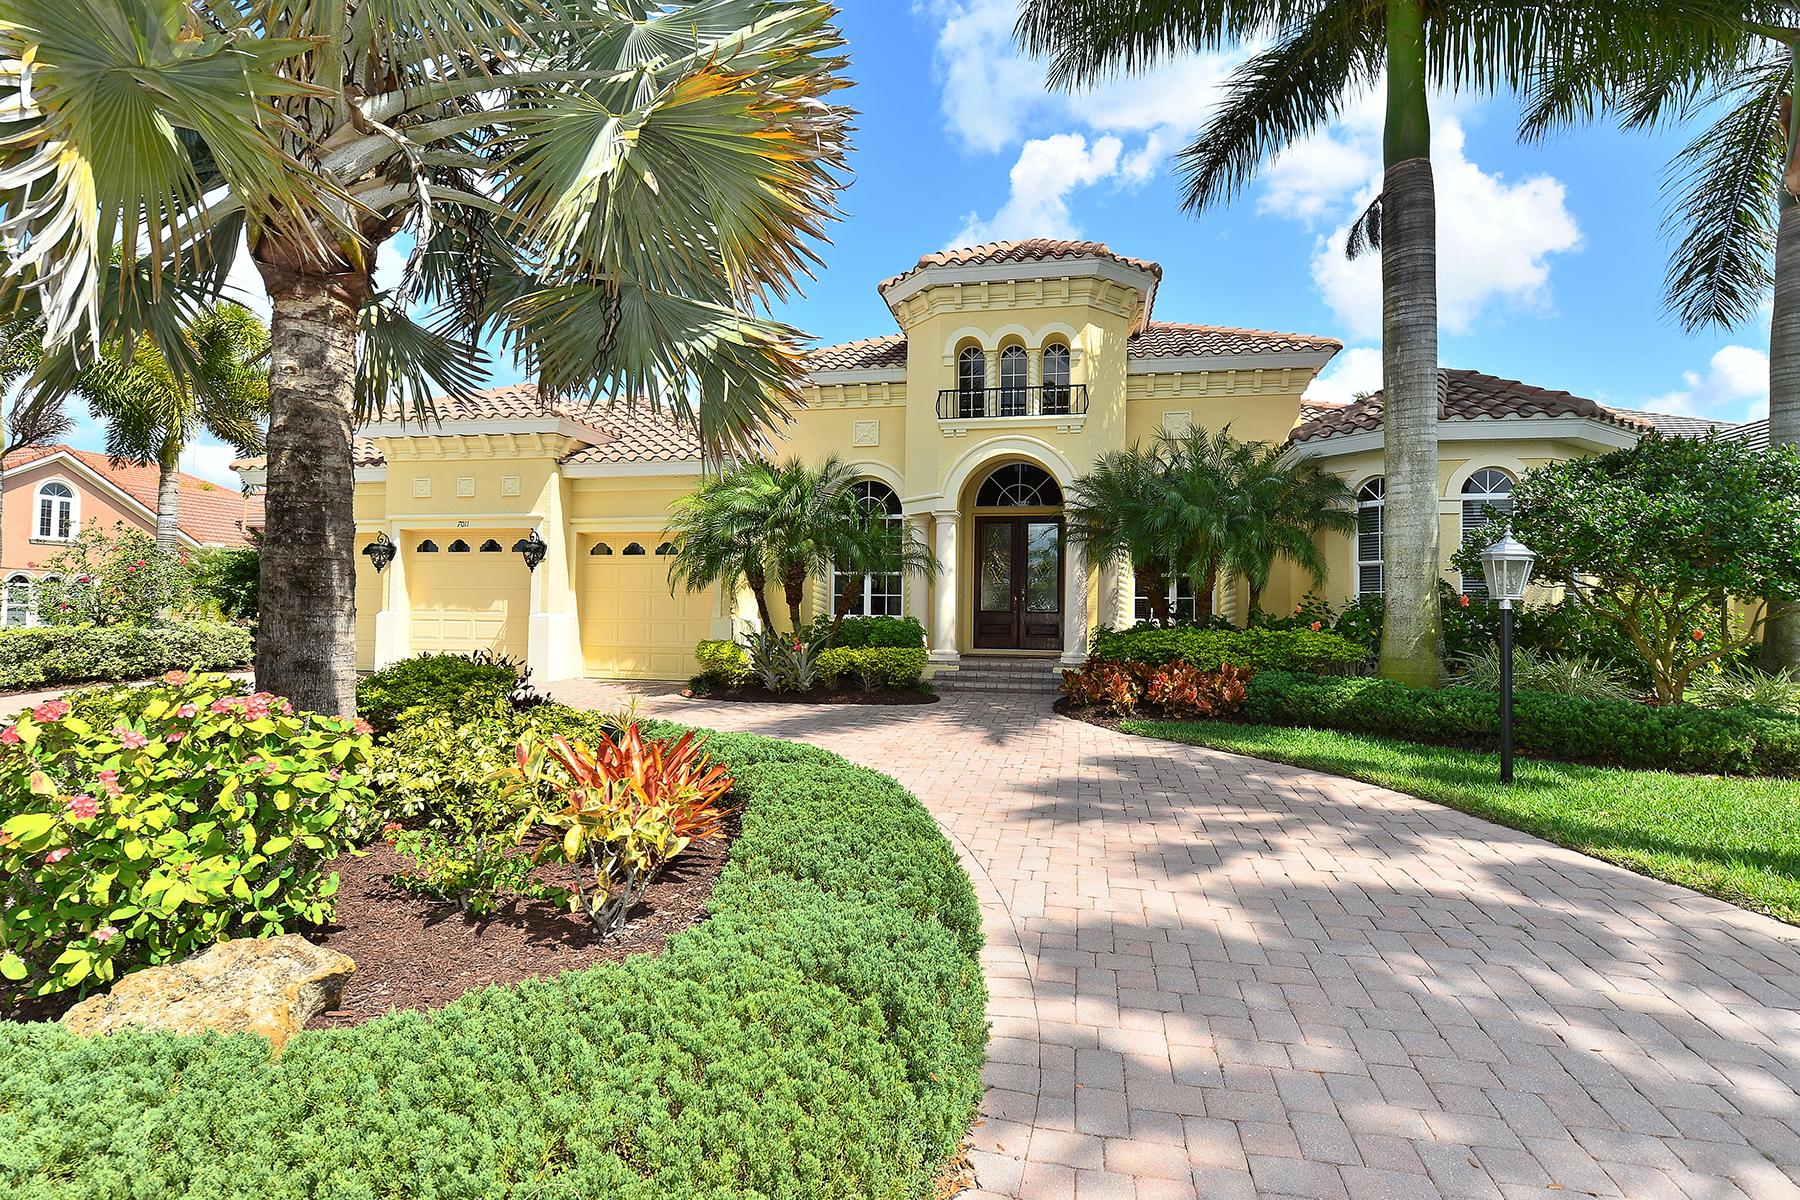 獨棟家庭住宅 為 出售 在 LAKEWOOD RANCH COUNTRY CLUB 7011 Dominion Ln Lakewood Ranch, 佛羅里達州 34202 美國